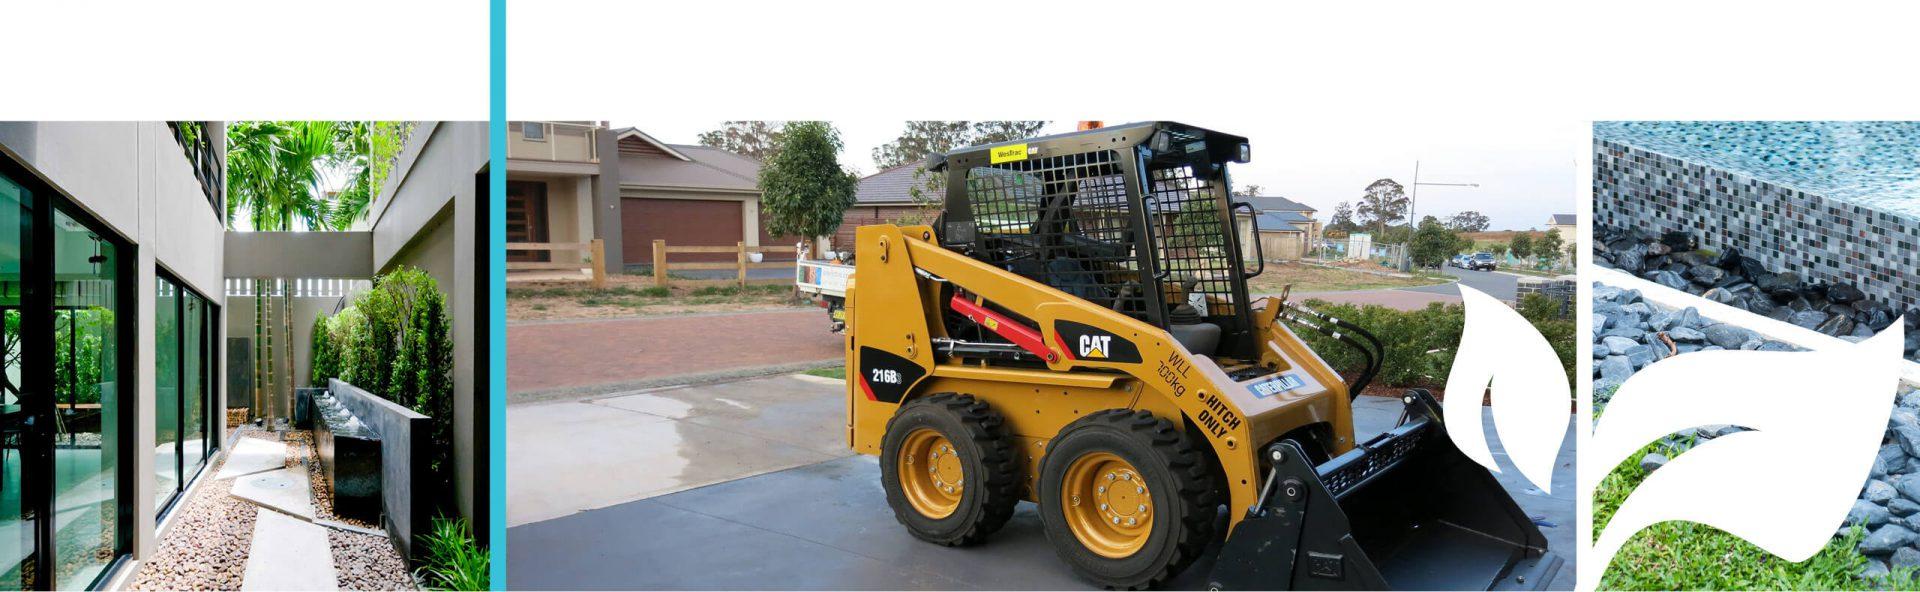 Bobcat on site for a landscape project